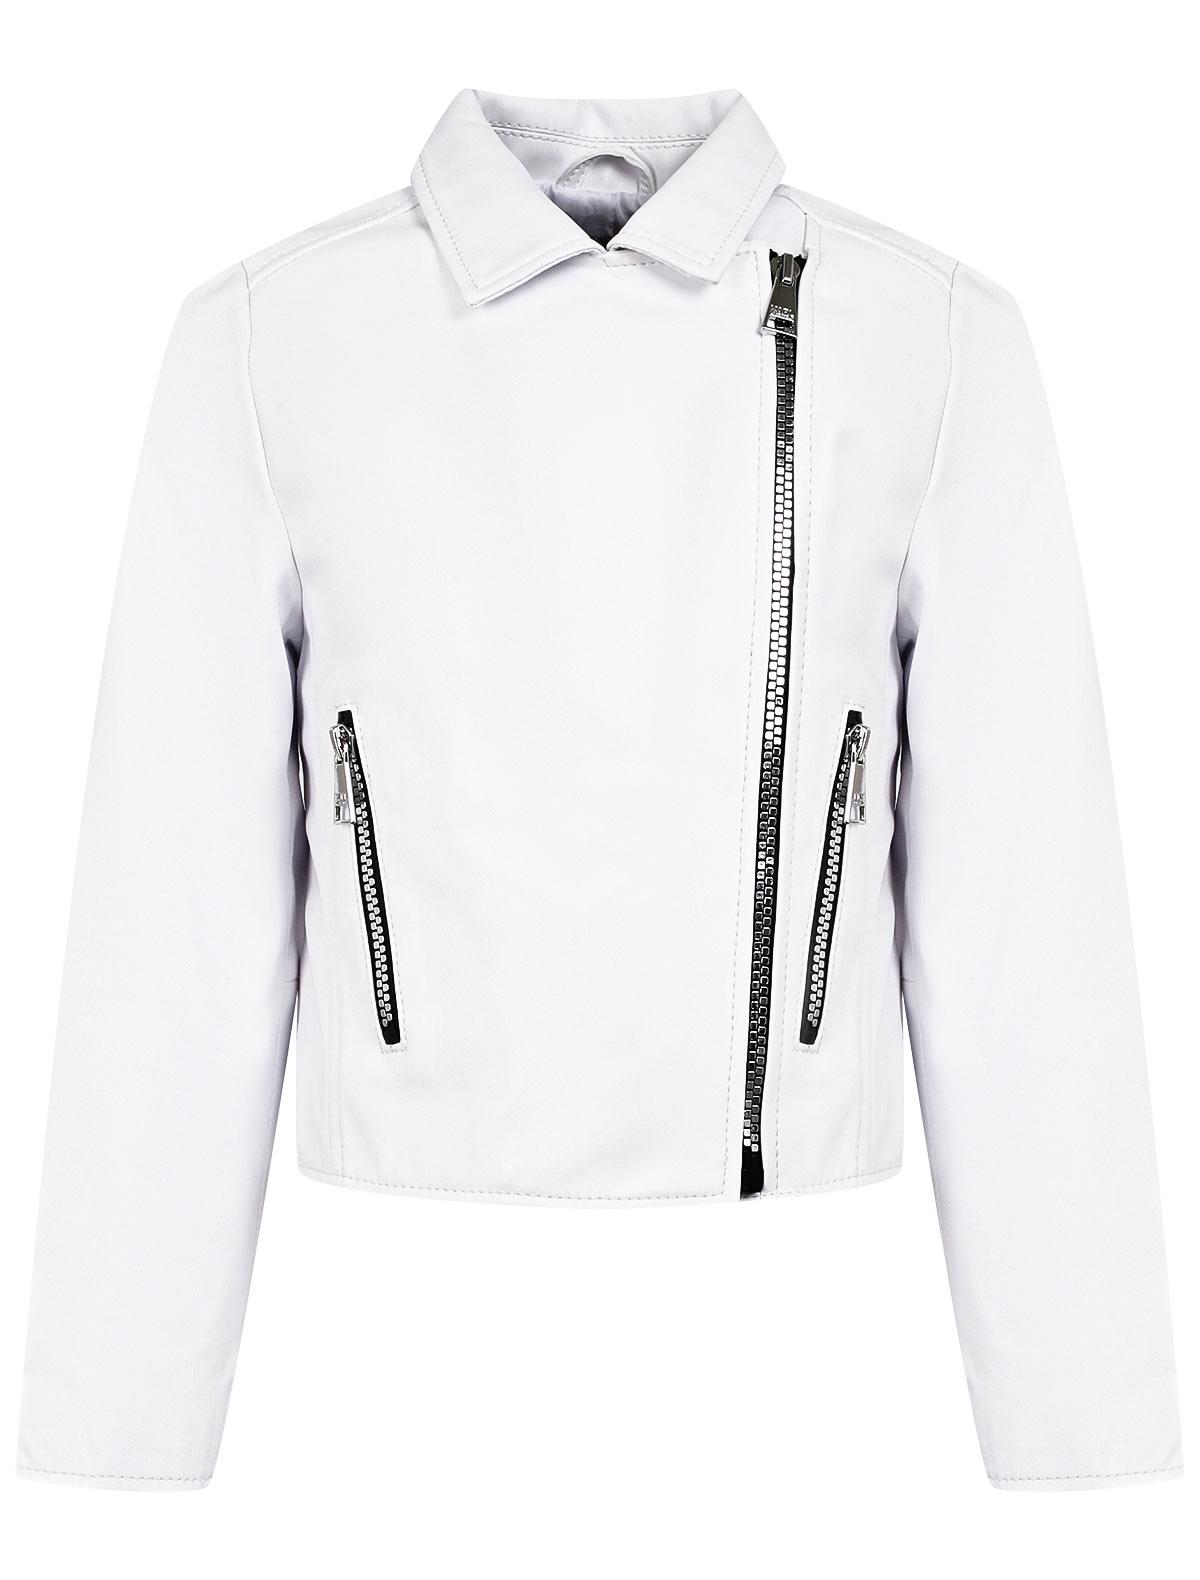 2311644, Куртка KARL LAGERFELD, белый, Женский, 1074509174127  - купить со скидкой